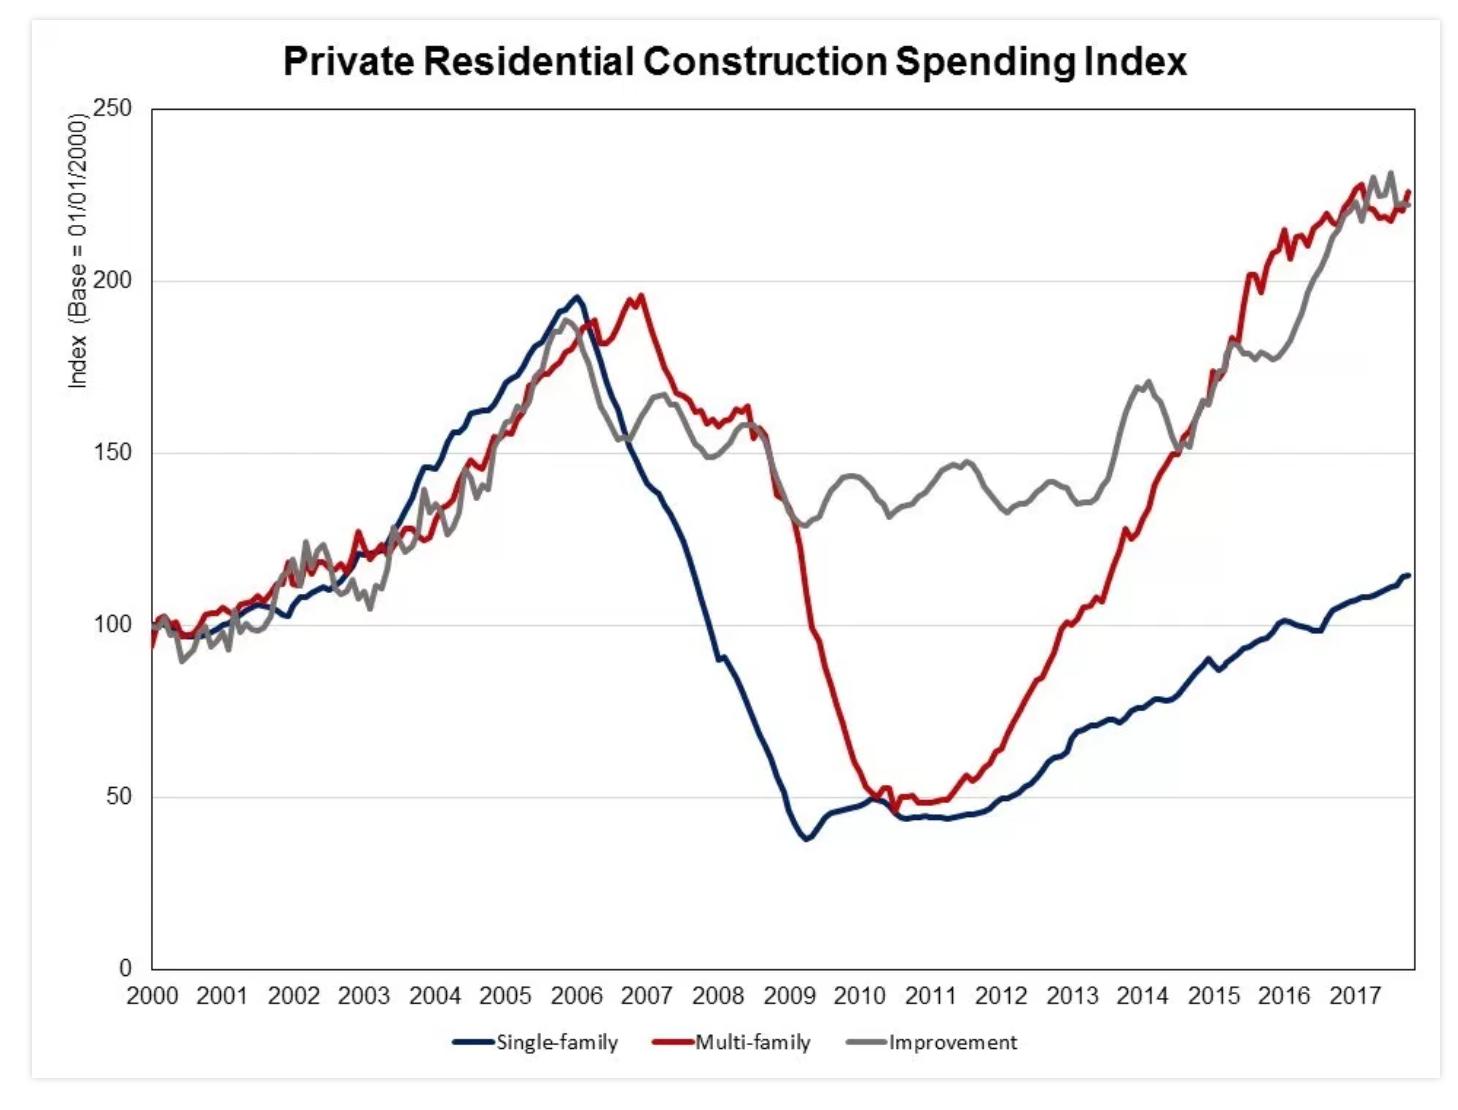 Source: National Association of Homebuilders